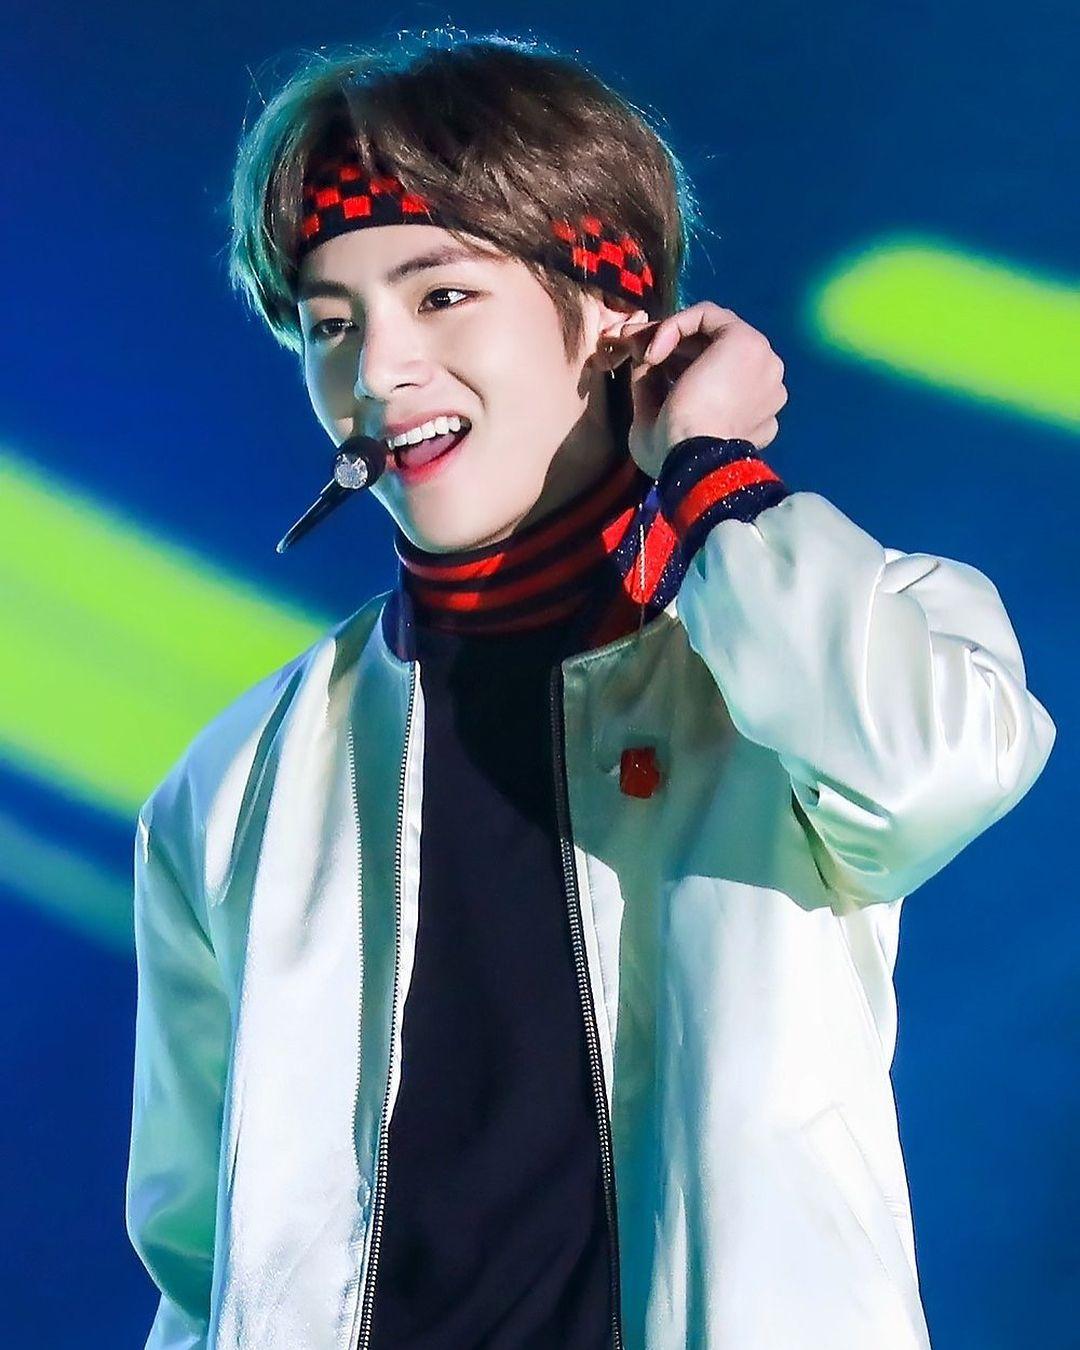 Most Handsome K Pop Male Idols Bts V Kim Tae Hyung Kpop K Pop Music K Pop Boy Groups Best K Pop Boy Bands Top K Pop Bo Taehyung Kim Taehyung Kim